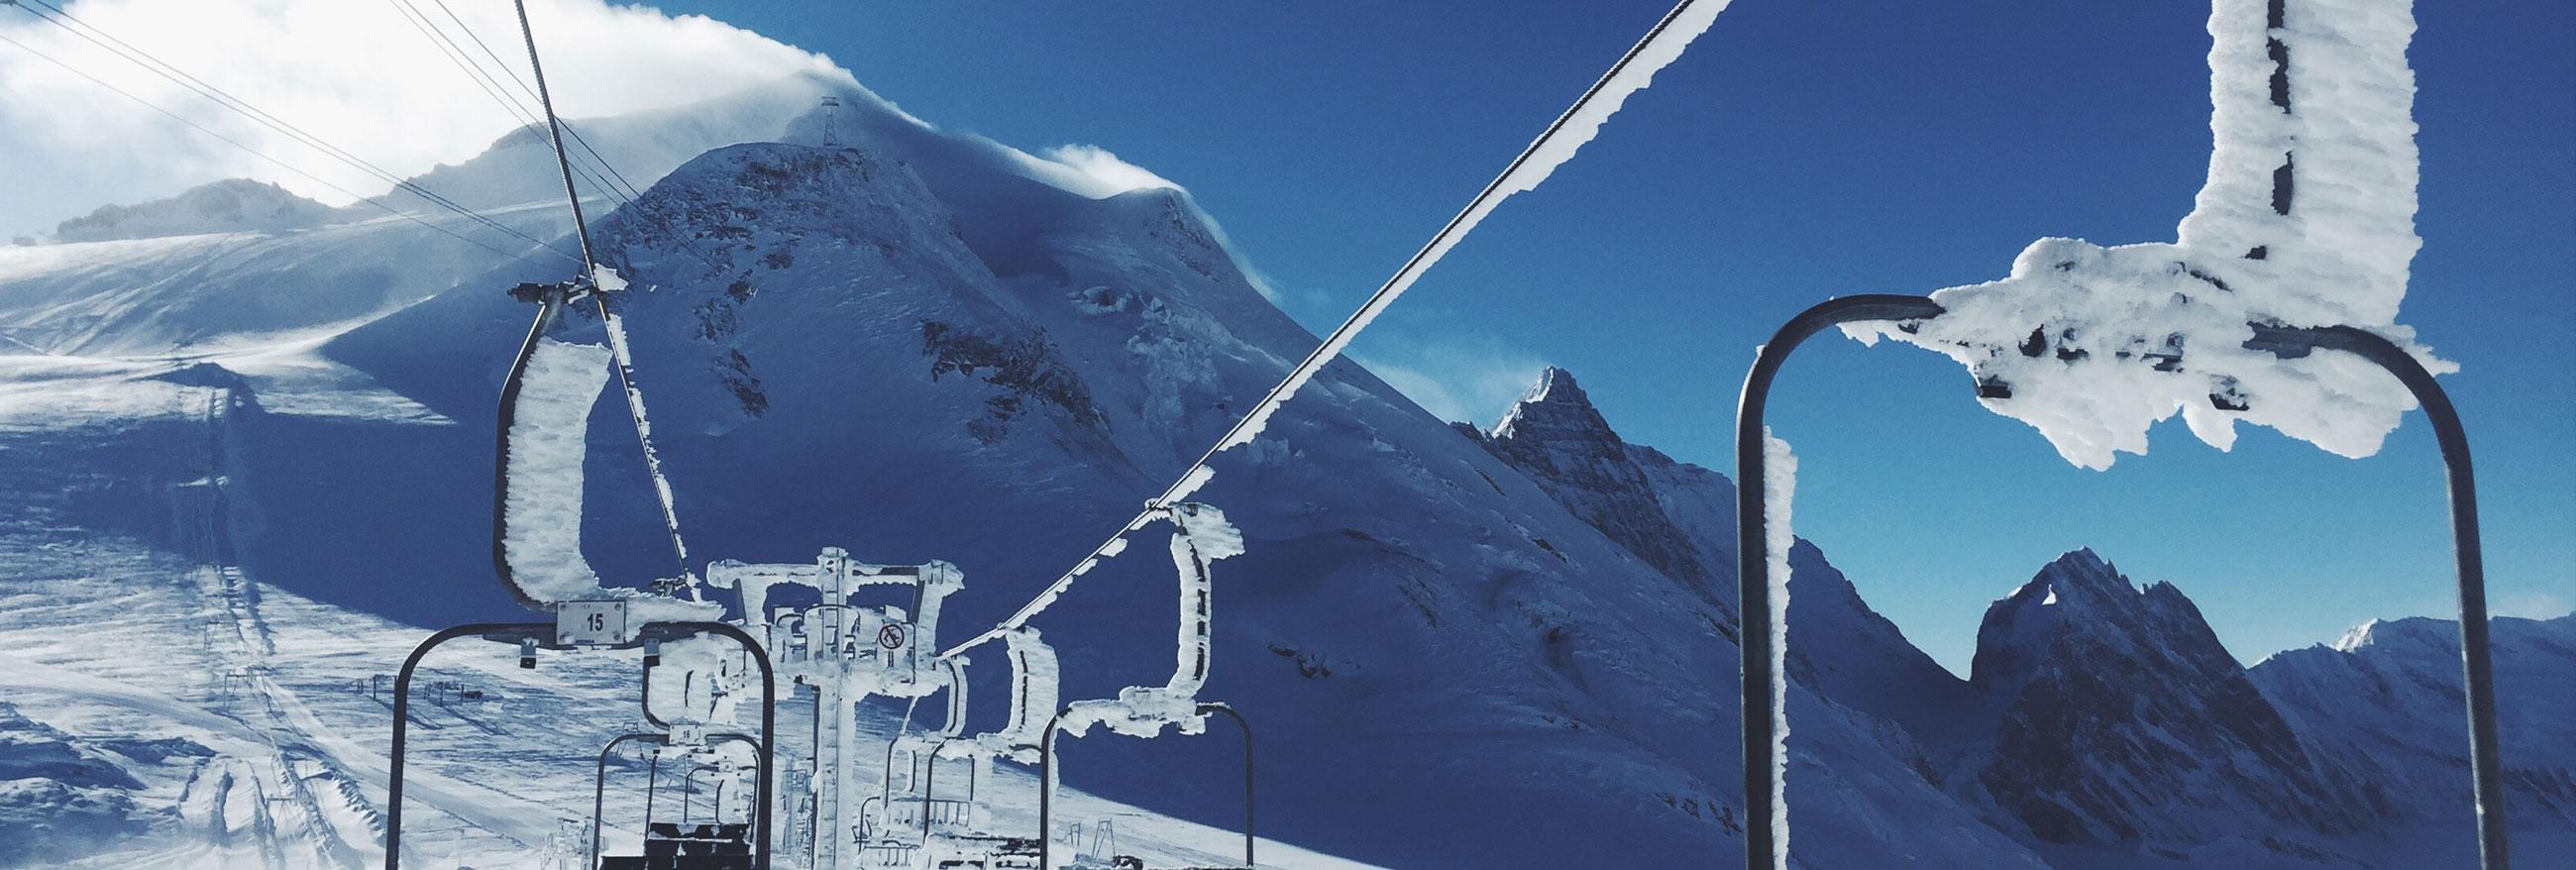 Ski Resort Jobs – The job board for ski resort, ski area